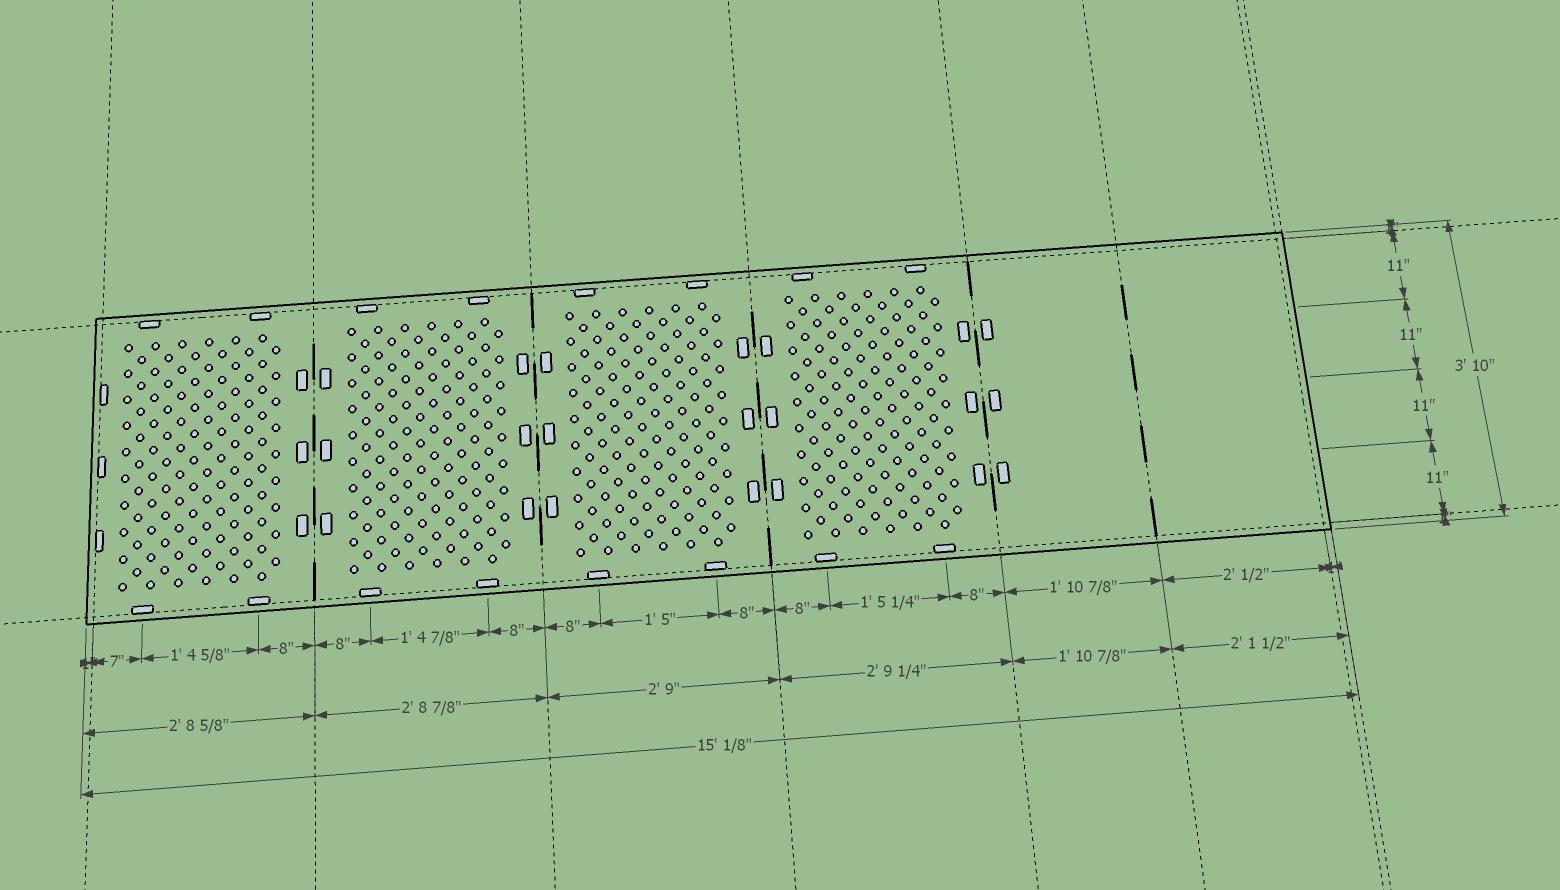 Click image for larger version  Name:Floor CNC Design 200121.jpg Views:40 Size:446.1 KB ID:41919